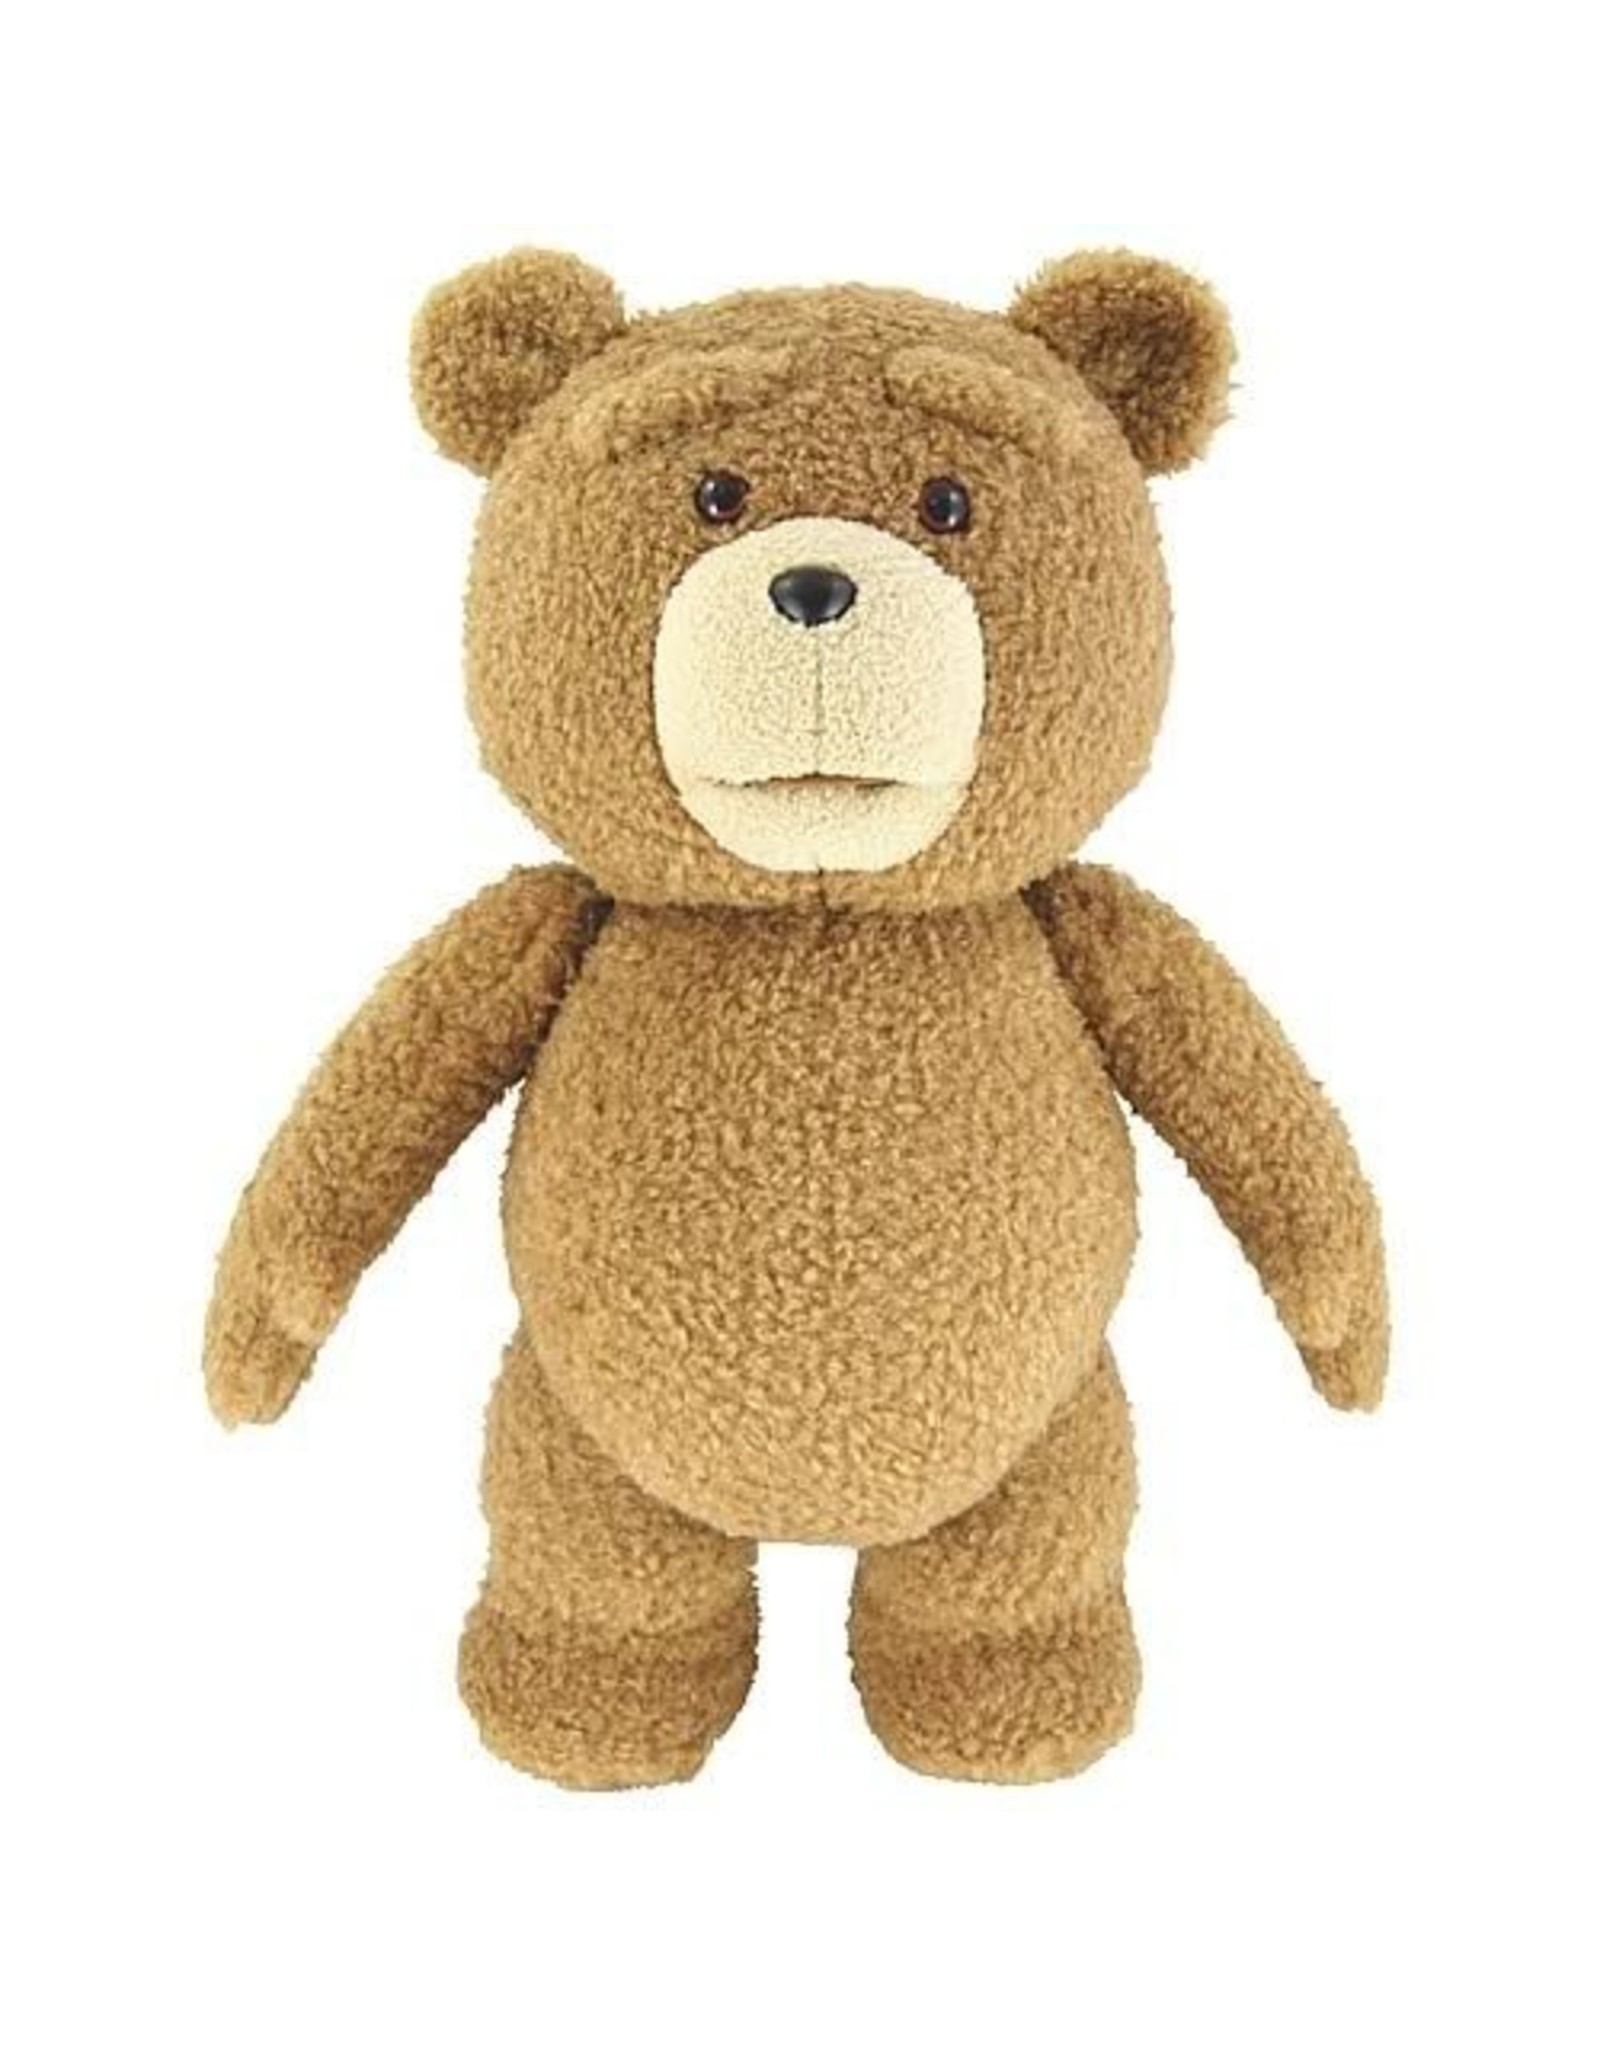 Seth MacFarlane - Ted : R-rated  [Plush Teddy Bear]